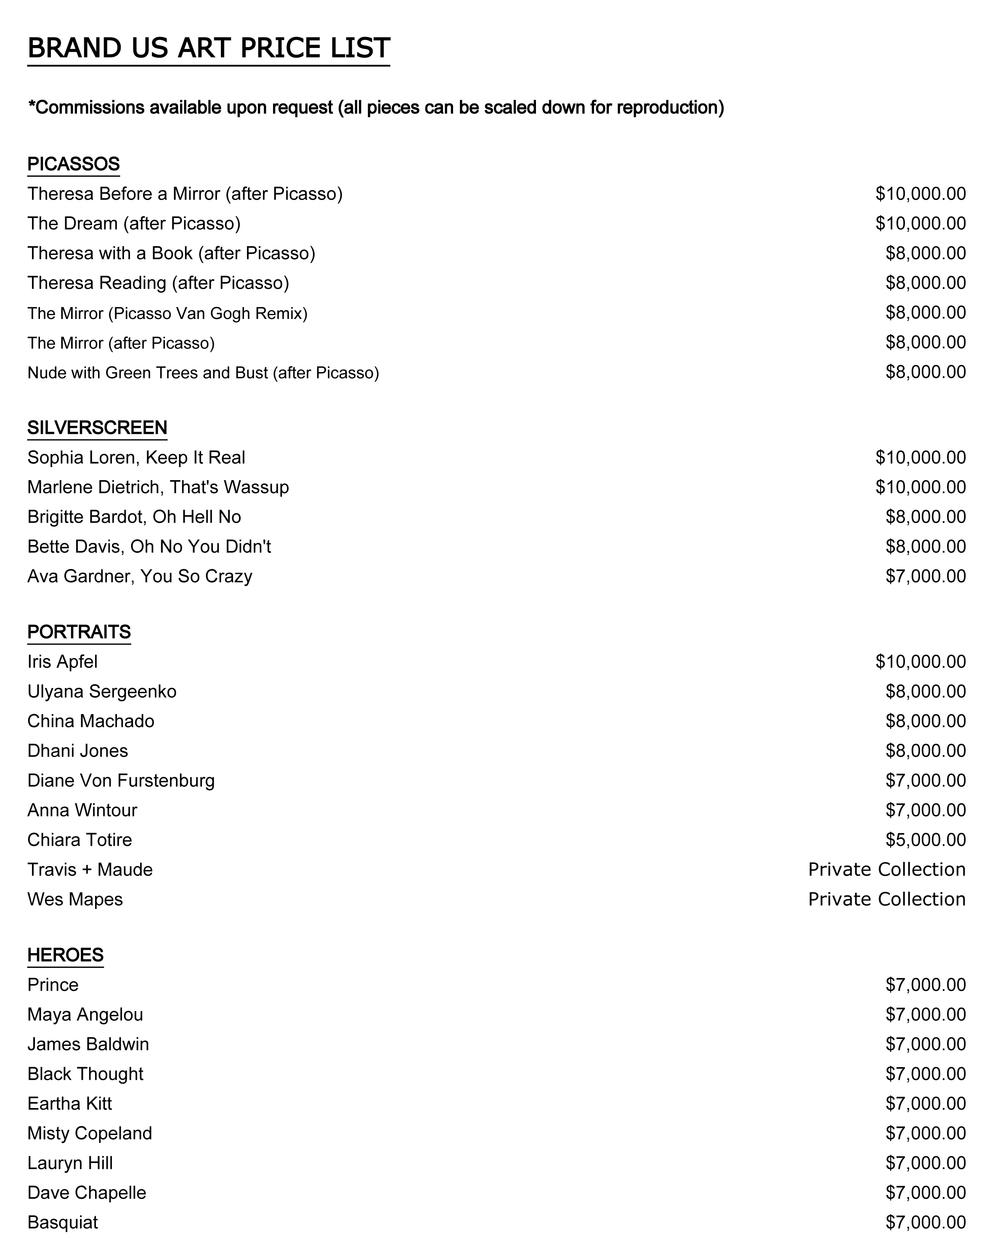 Brand Us Art Price List .jpg